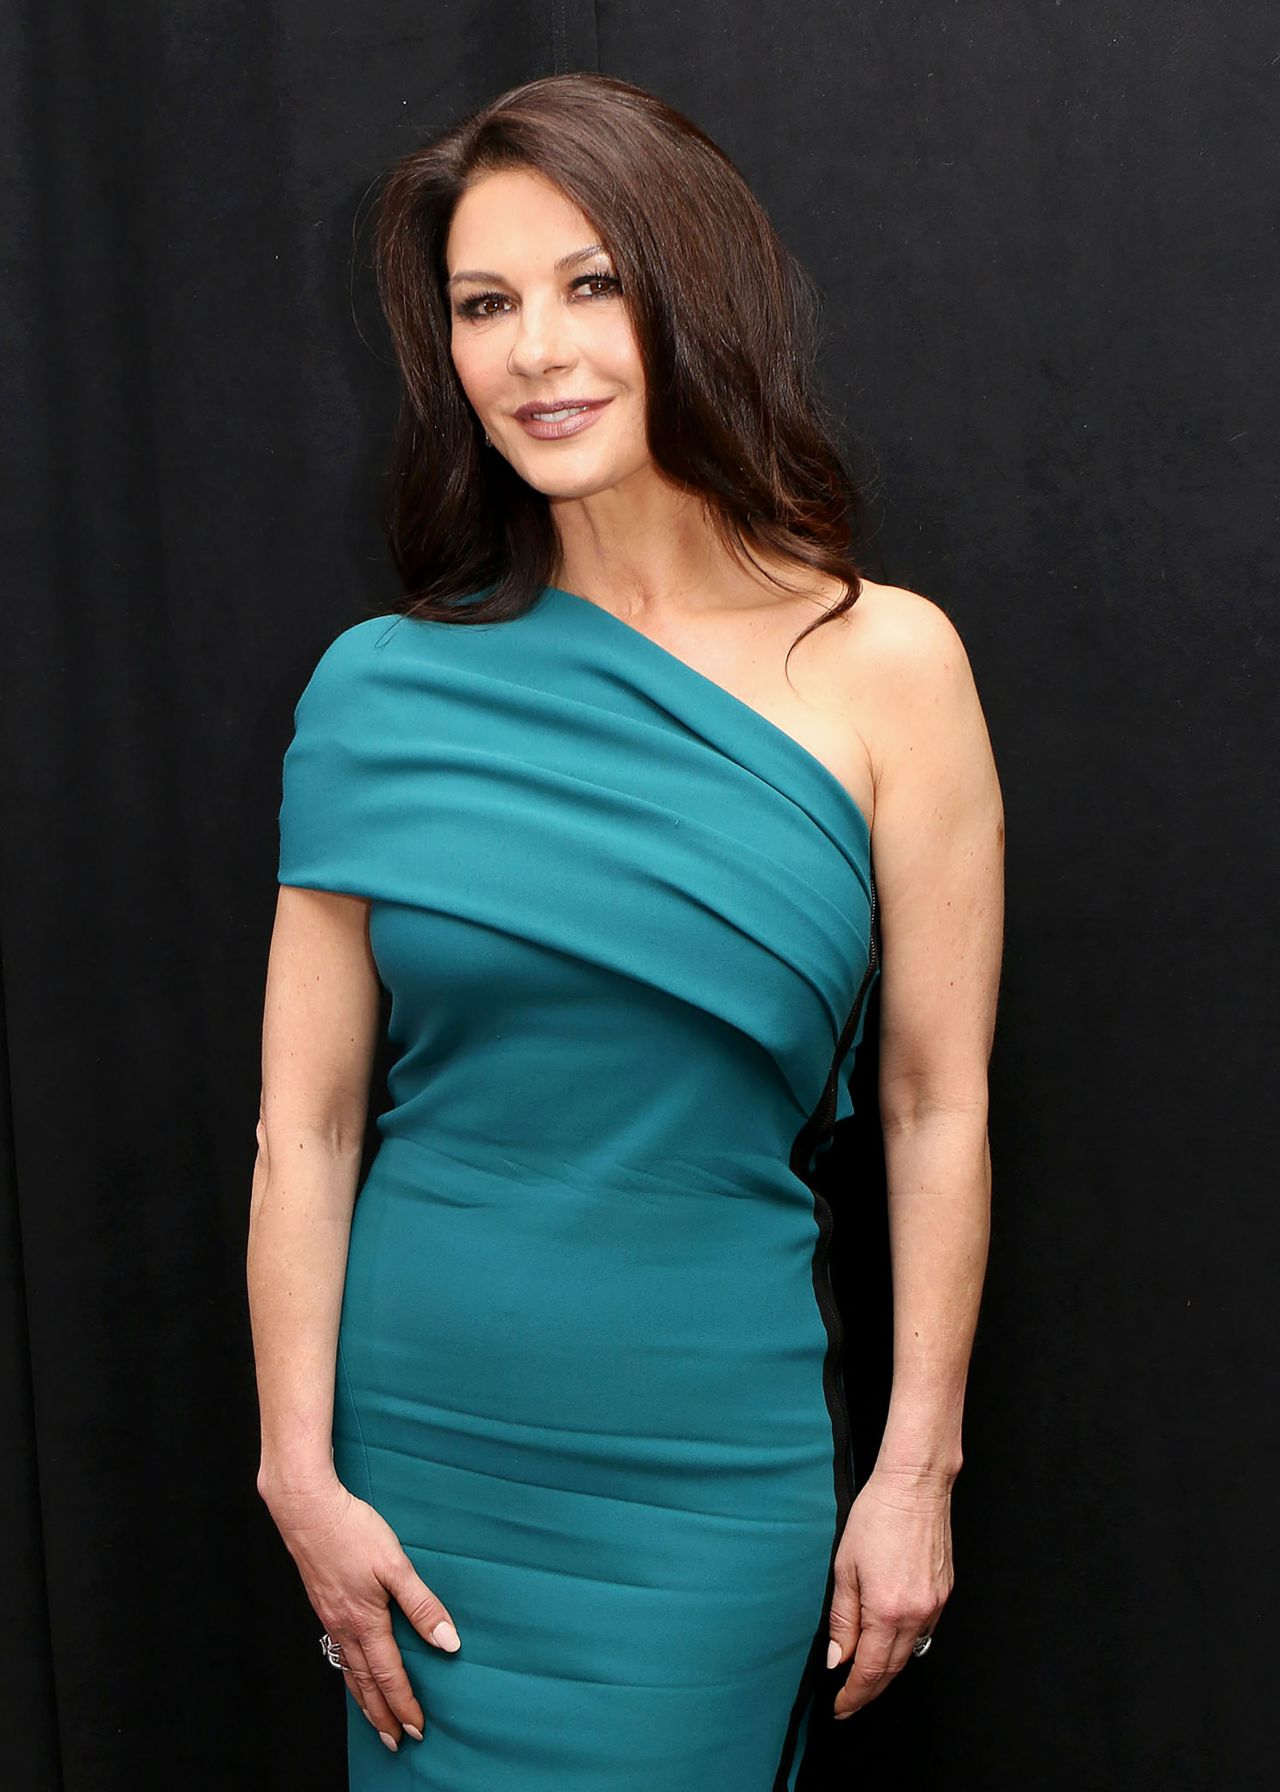 Catherine Zeta-Jones Attends 'Feud' Press Conference in ... Catherine Zeta Jones